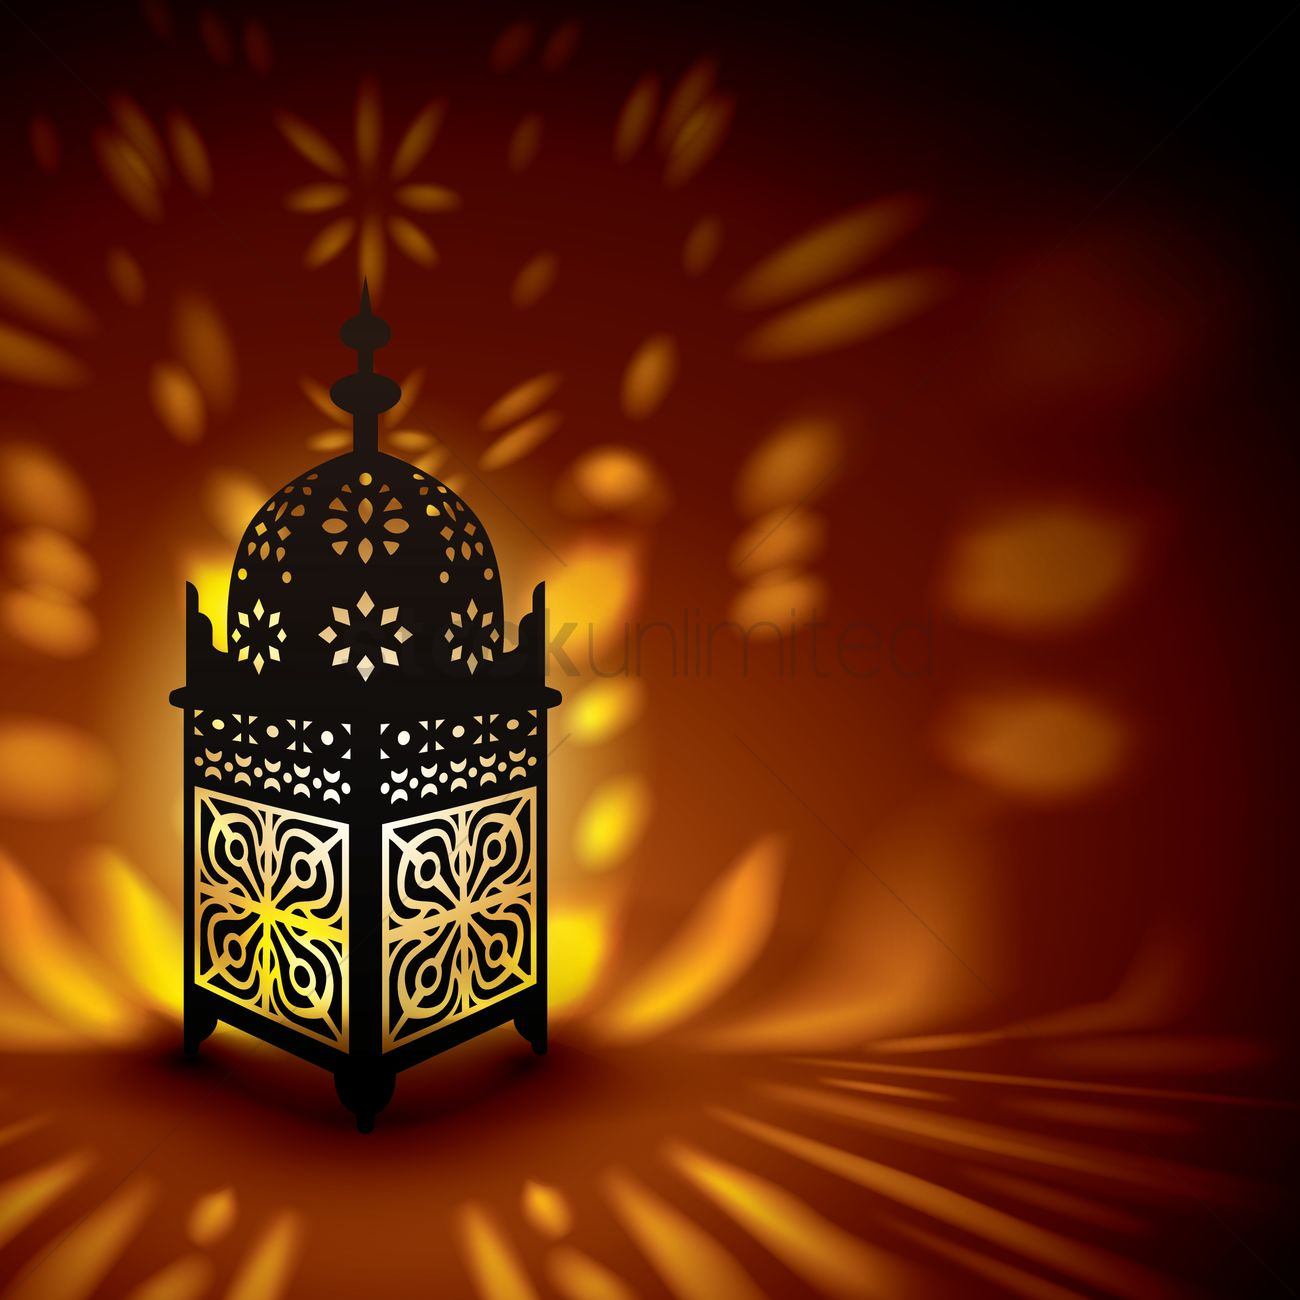 a lit ramadan lantern vector image 1826849 stockunlimited lantern clip art in black lantern clipart free